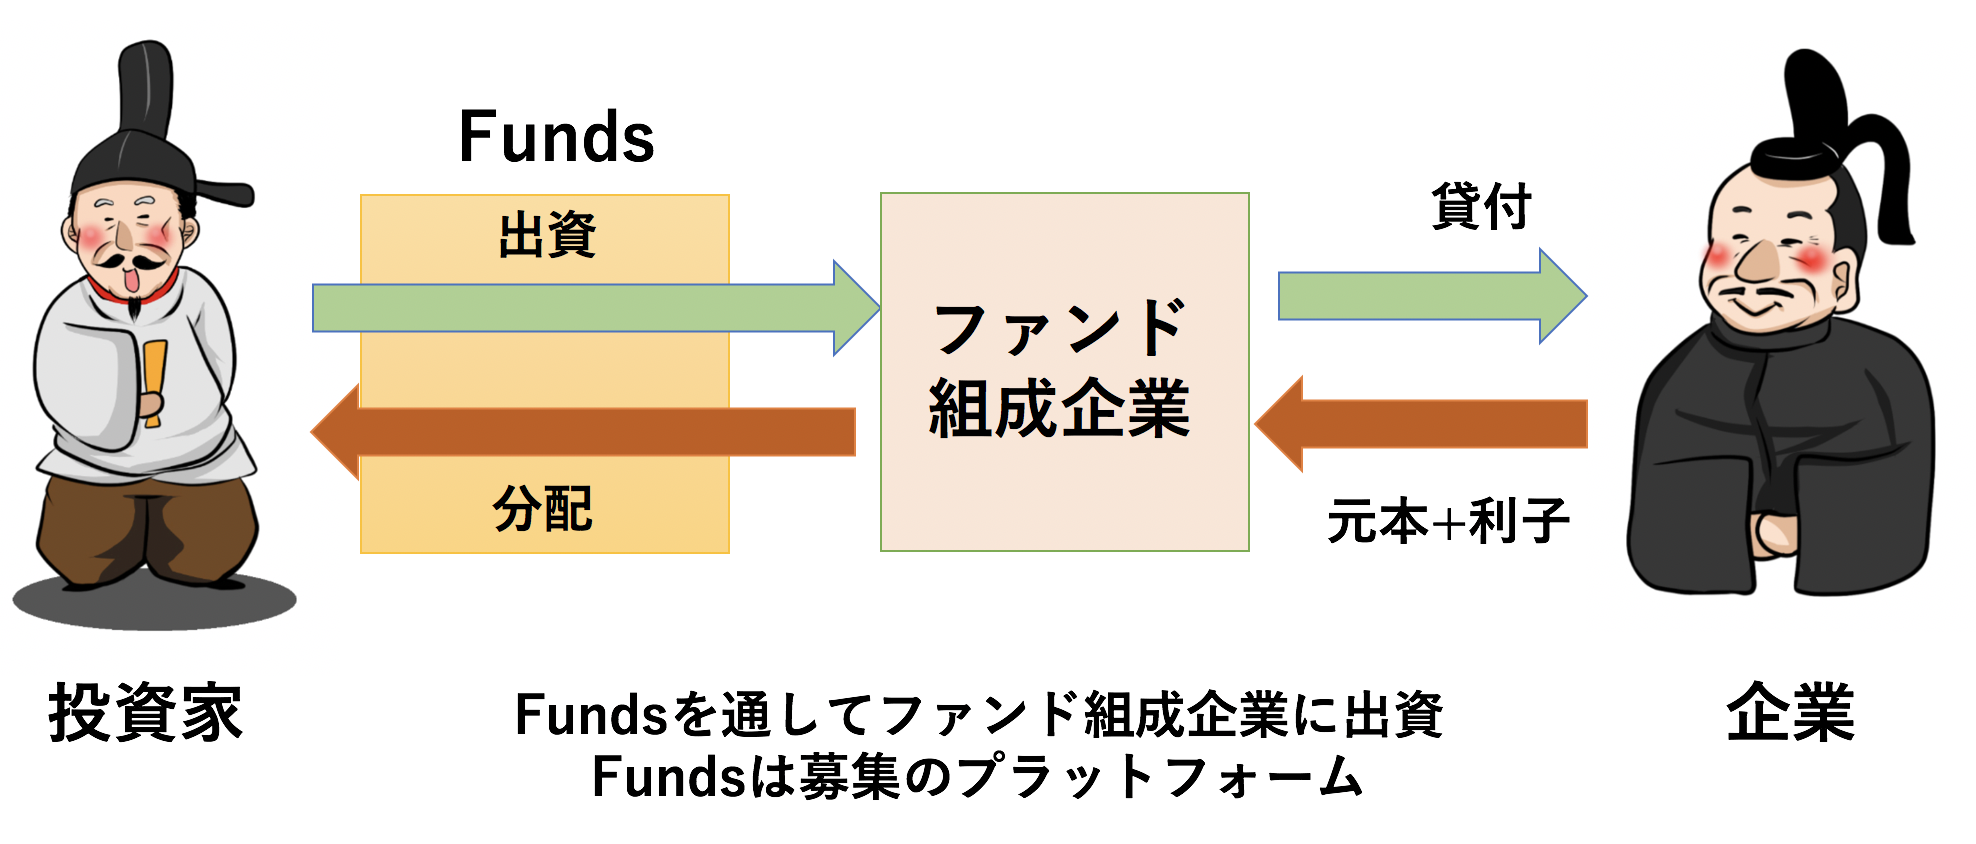 Funds(ファンズ)のスキーム